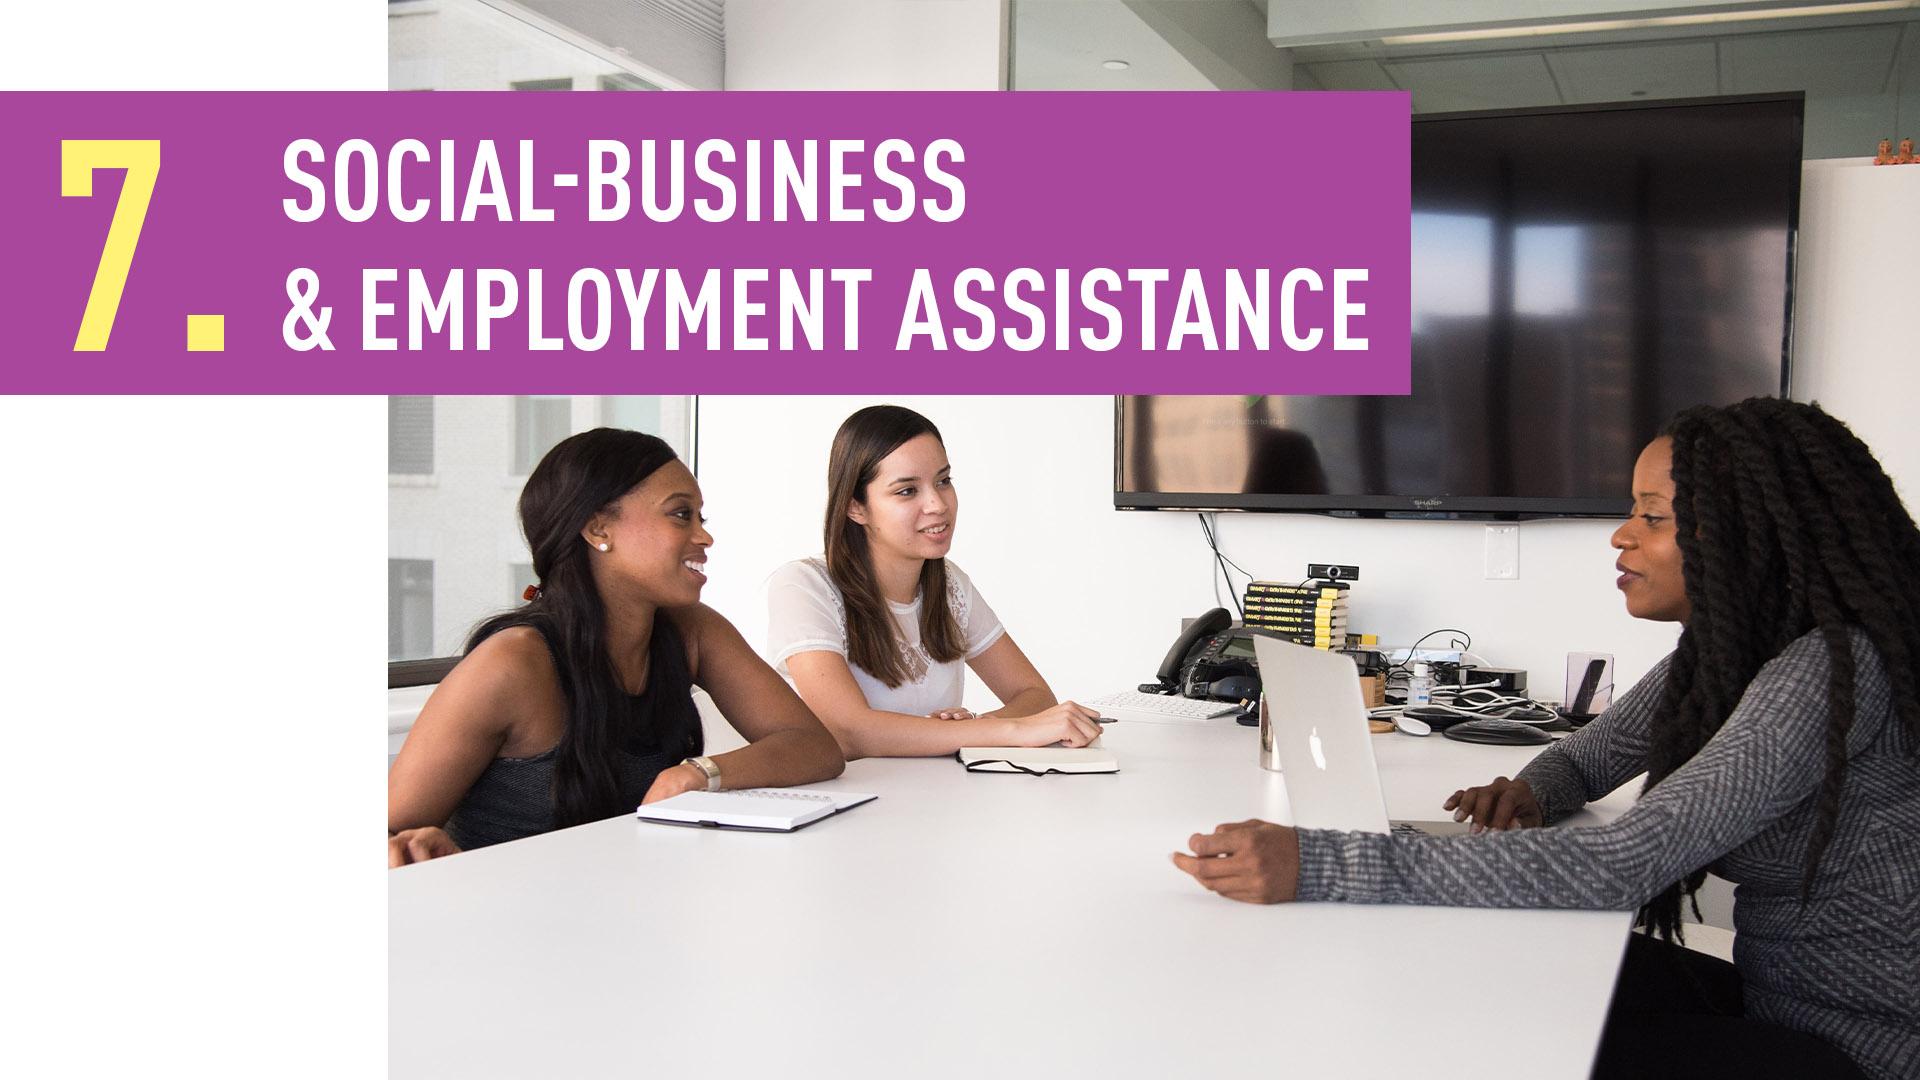 SOCIAL-BUSINESS & EMPLOYMENT ASSISTANCE